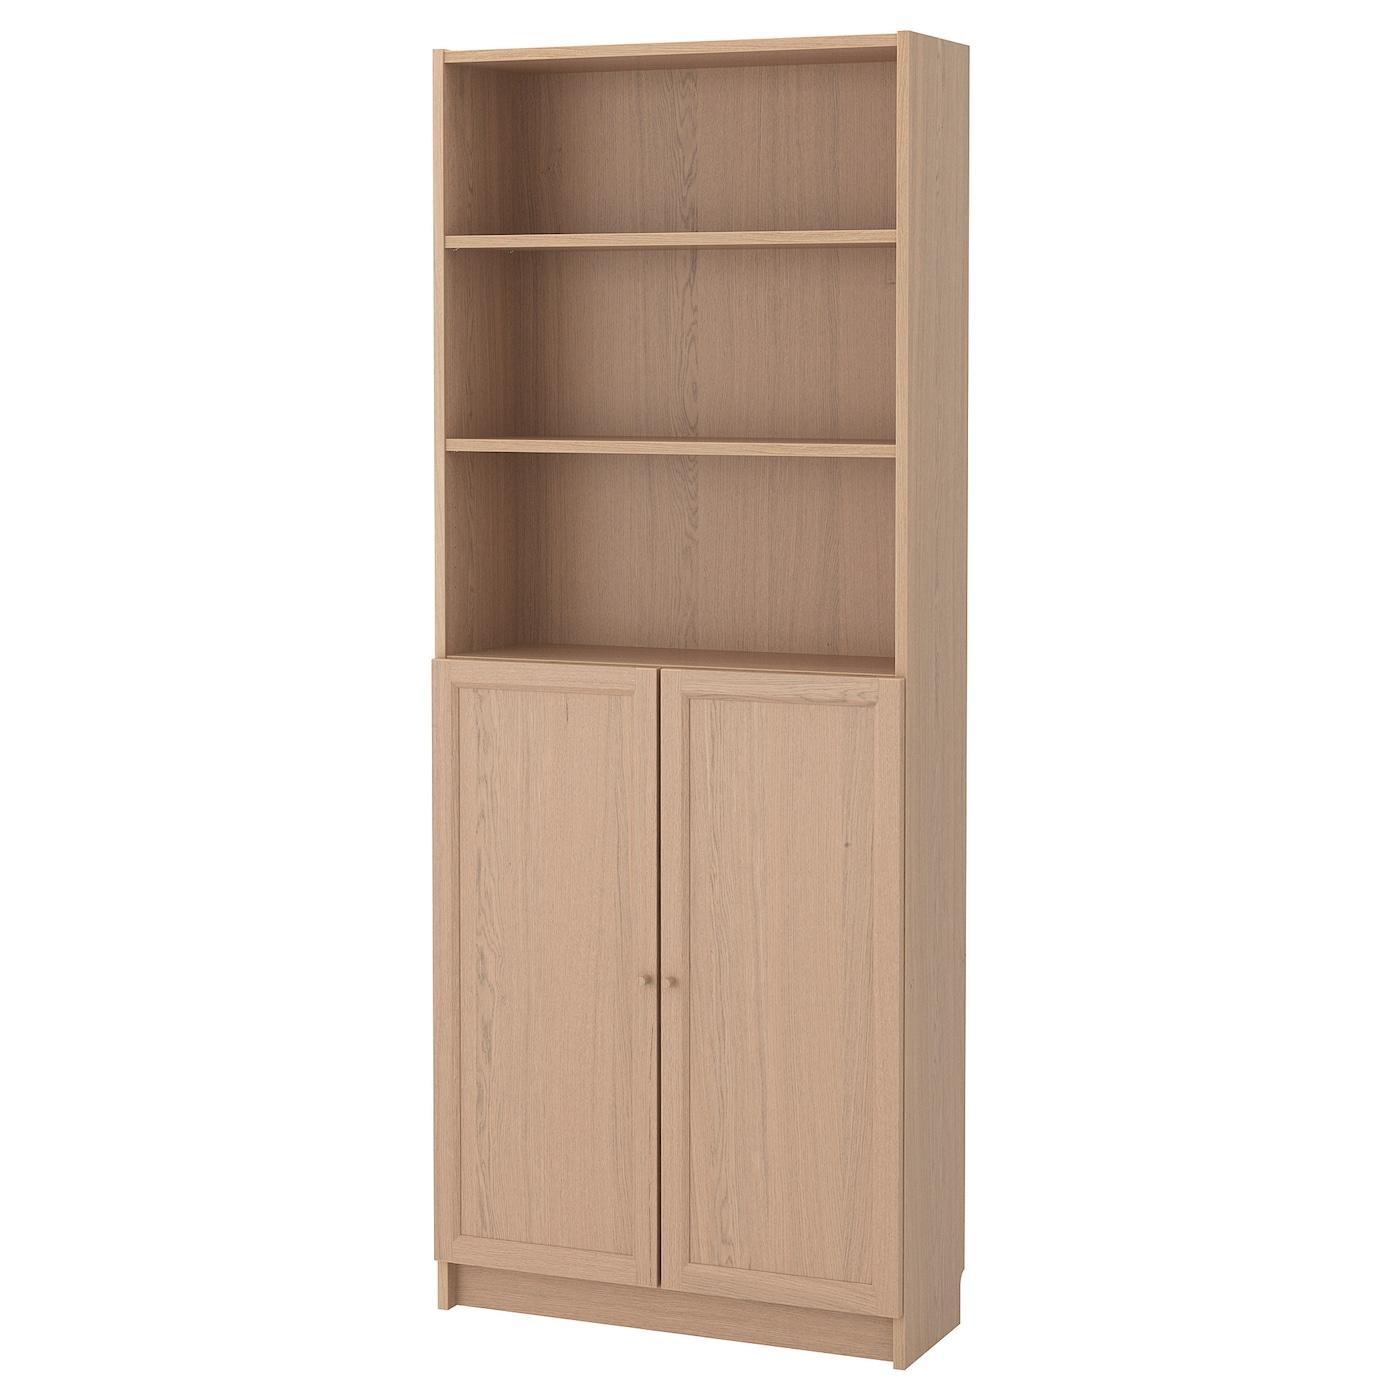 billy oxberg biblioth que avec portes plaqu ch ne blanchi 80 x 30 x 202 cm ikea. Black Bedroom Furniture Sets. Home Design Ideas